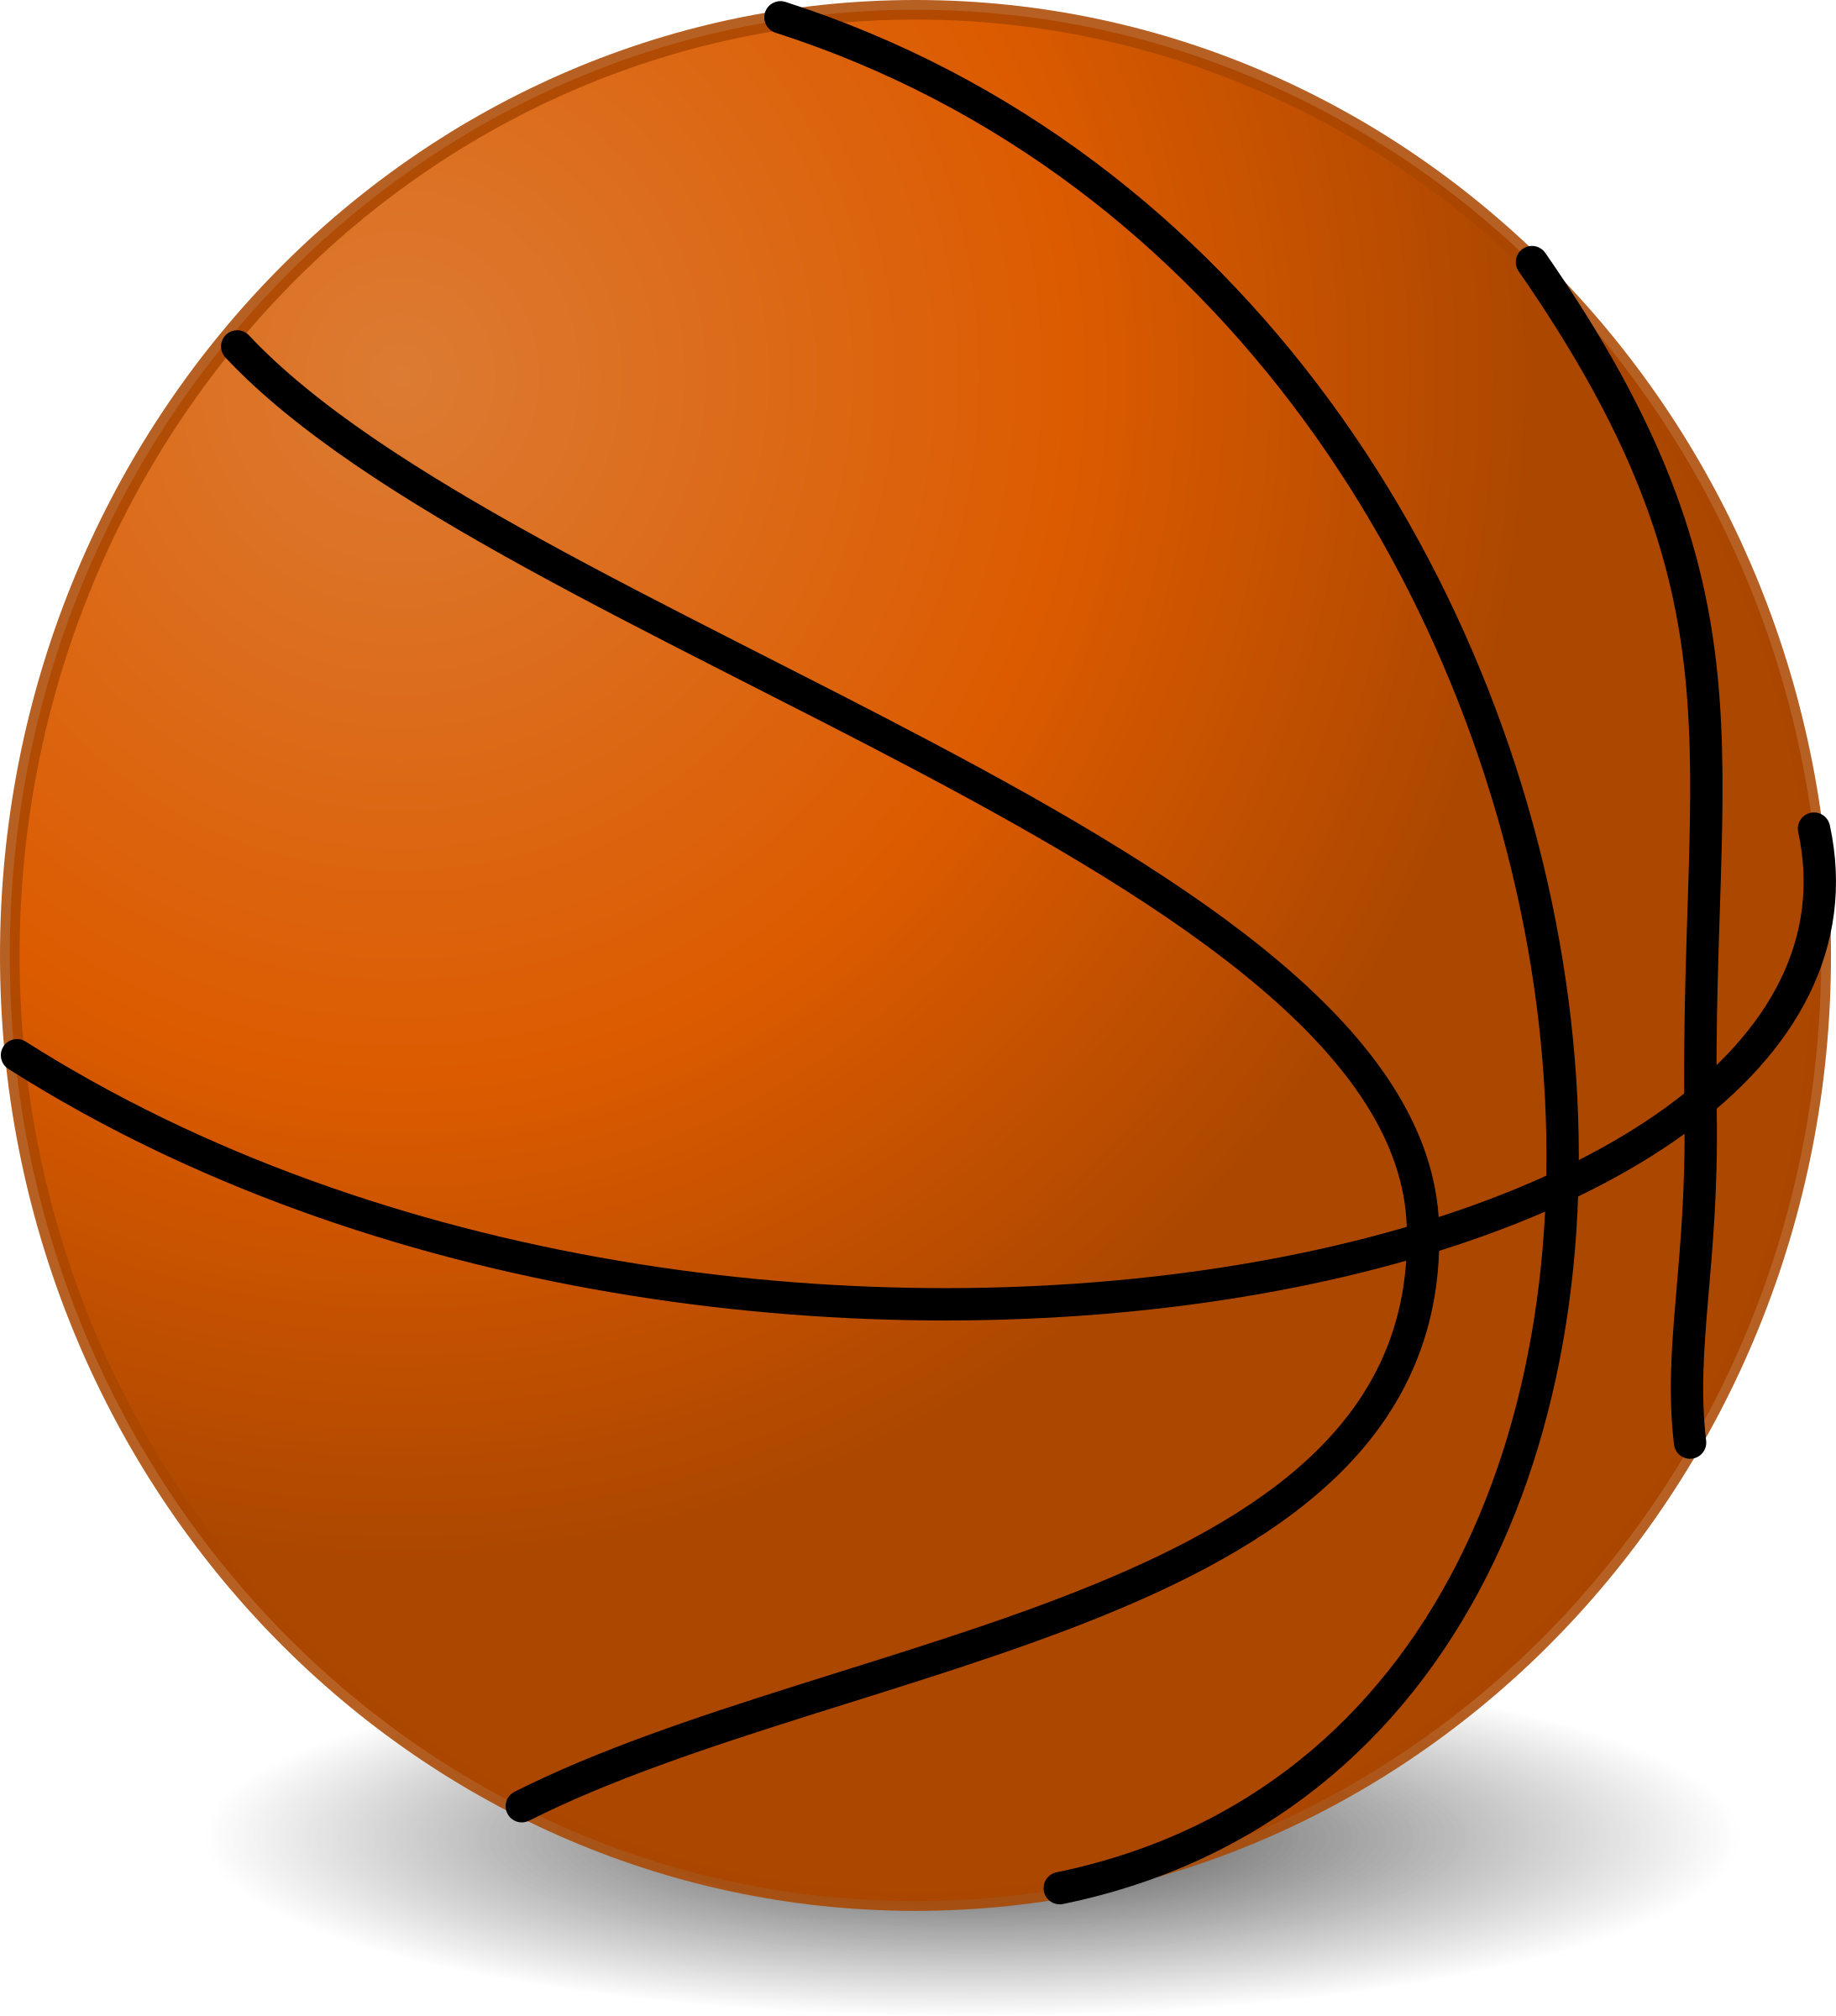 Cartoon basketball player clipart clip royalty free Clipart - basketball clip royalty free